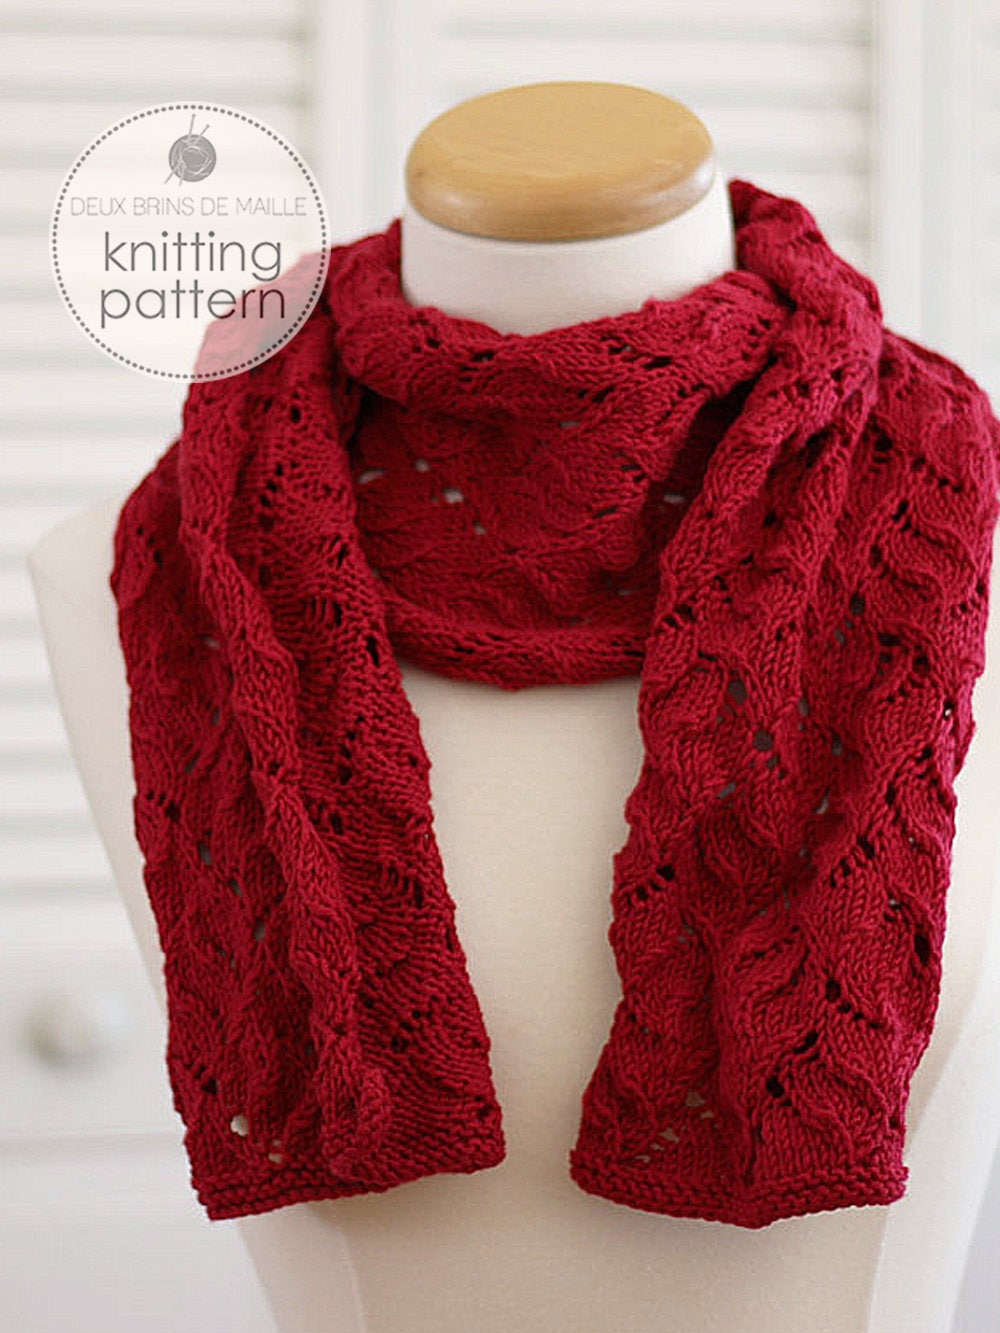 Knitting Accessories Patterns : Knitting pattern scarf knit patterns